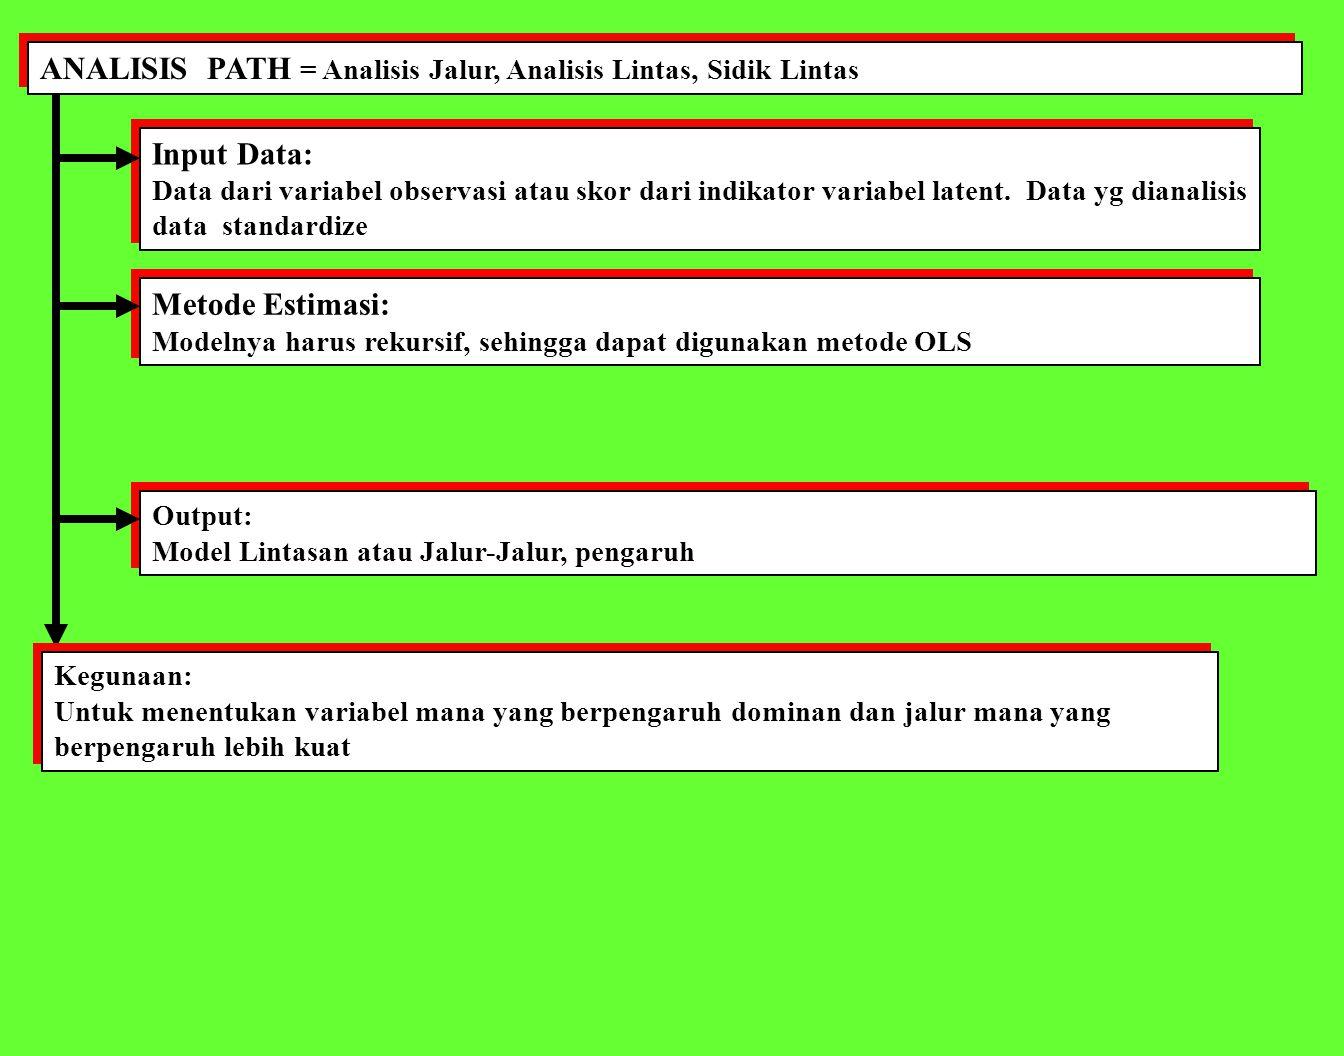 ANALISIS PATH = Analisis Jalur, Analisis Lintas, Sidik Lintas